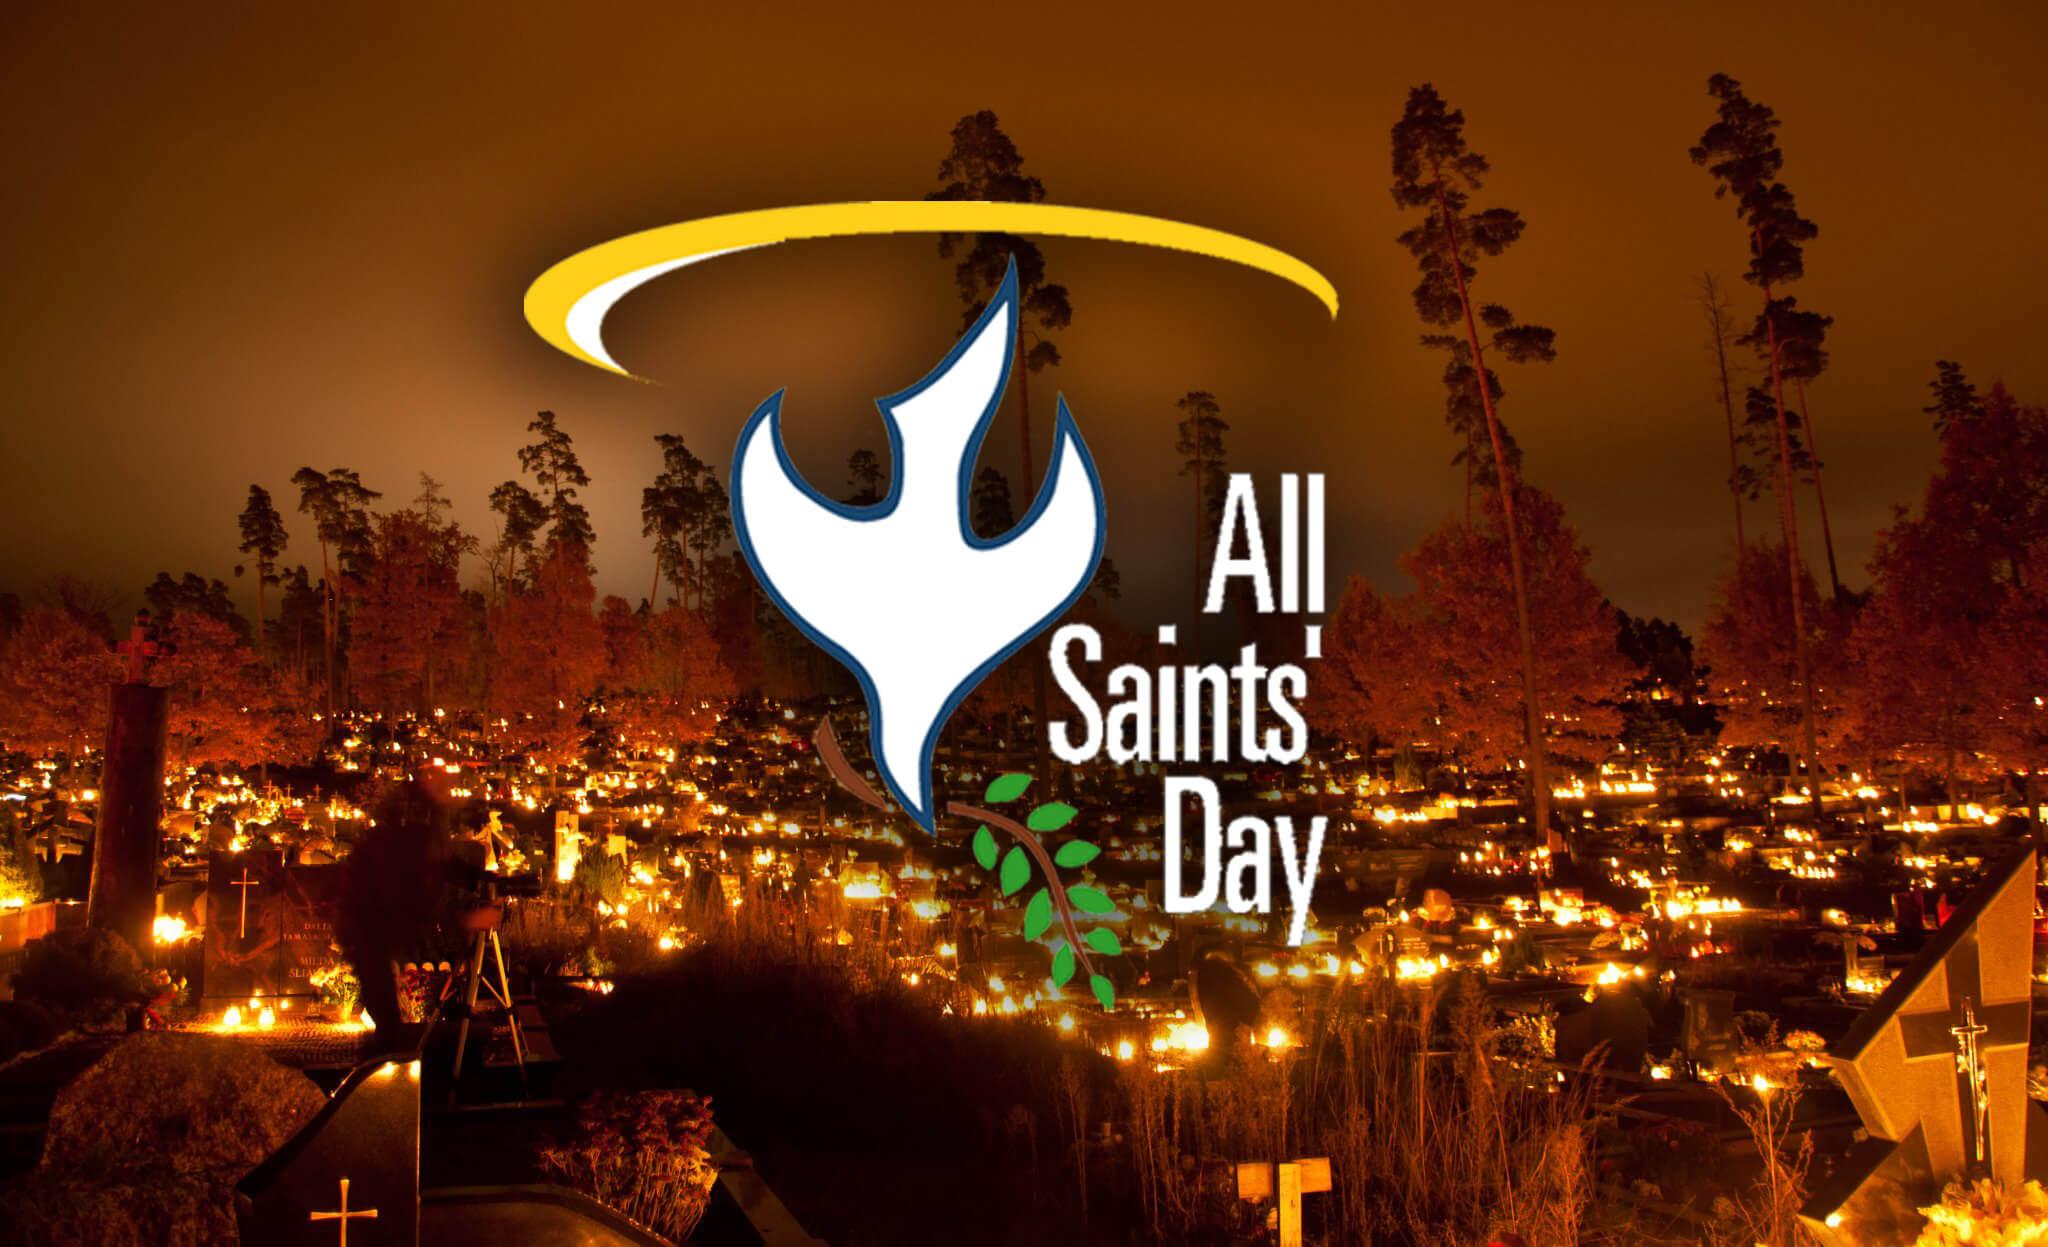 all saints day souls graveyard hd wallpaper